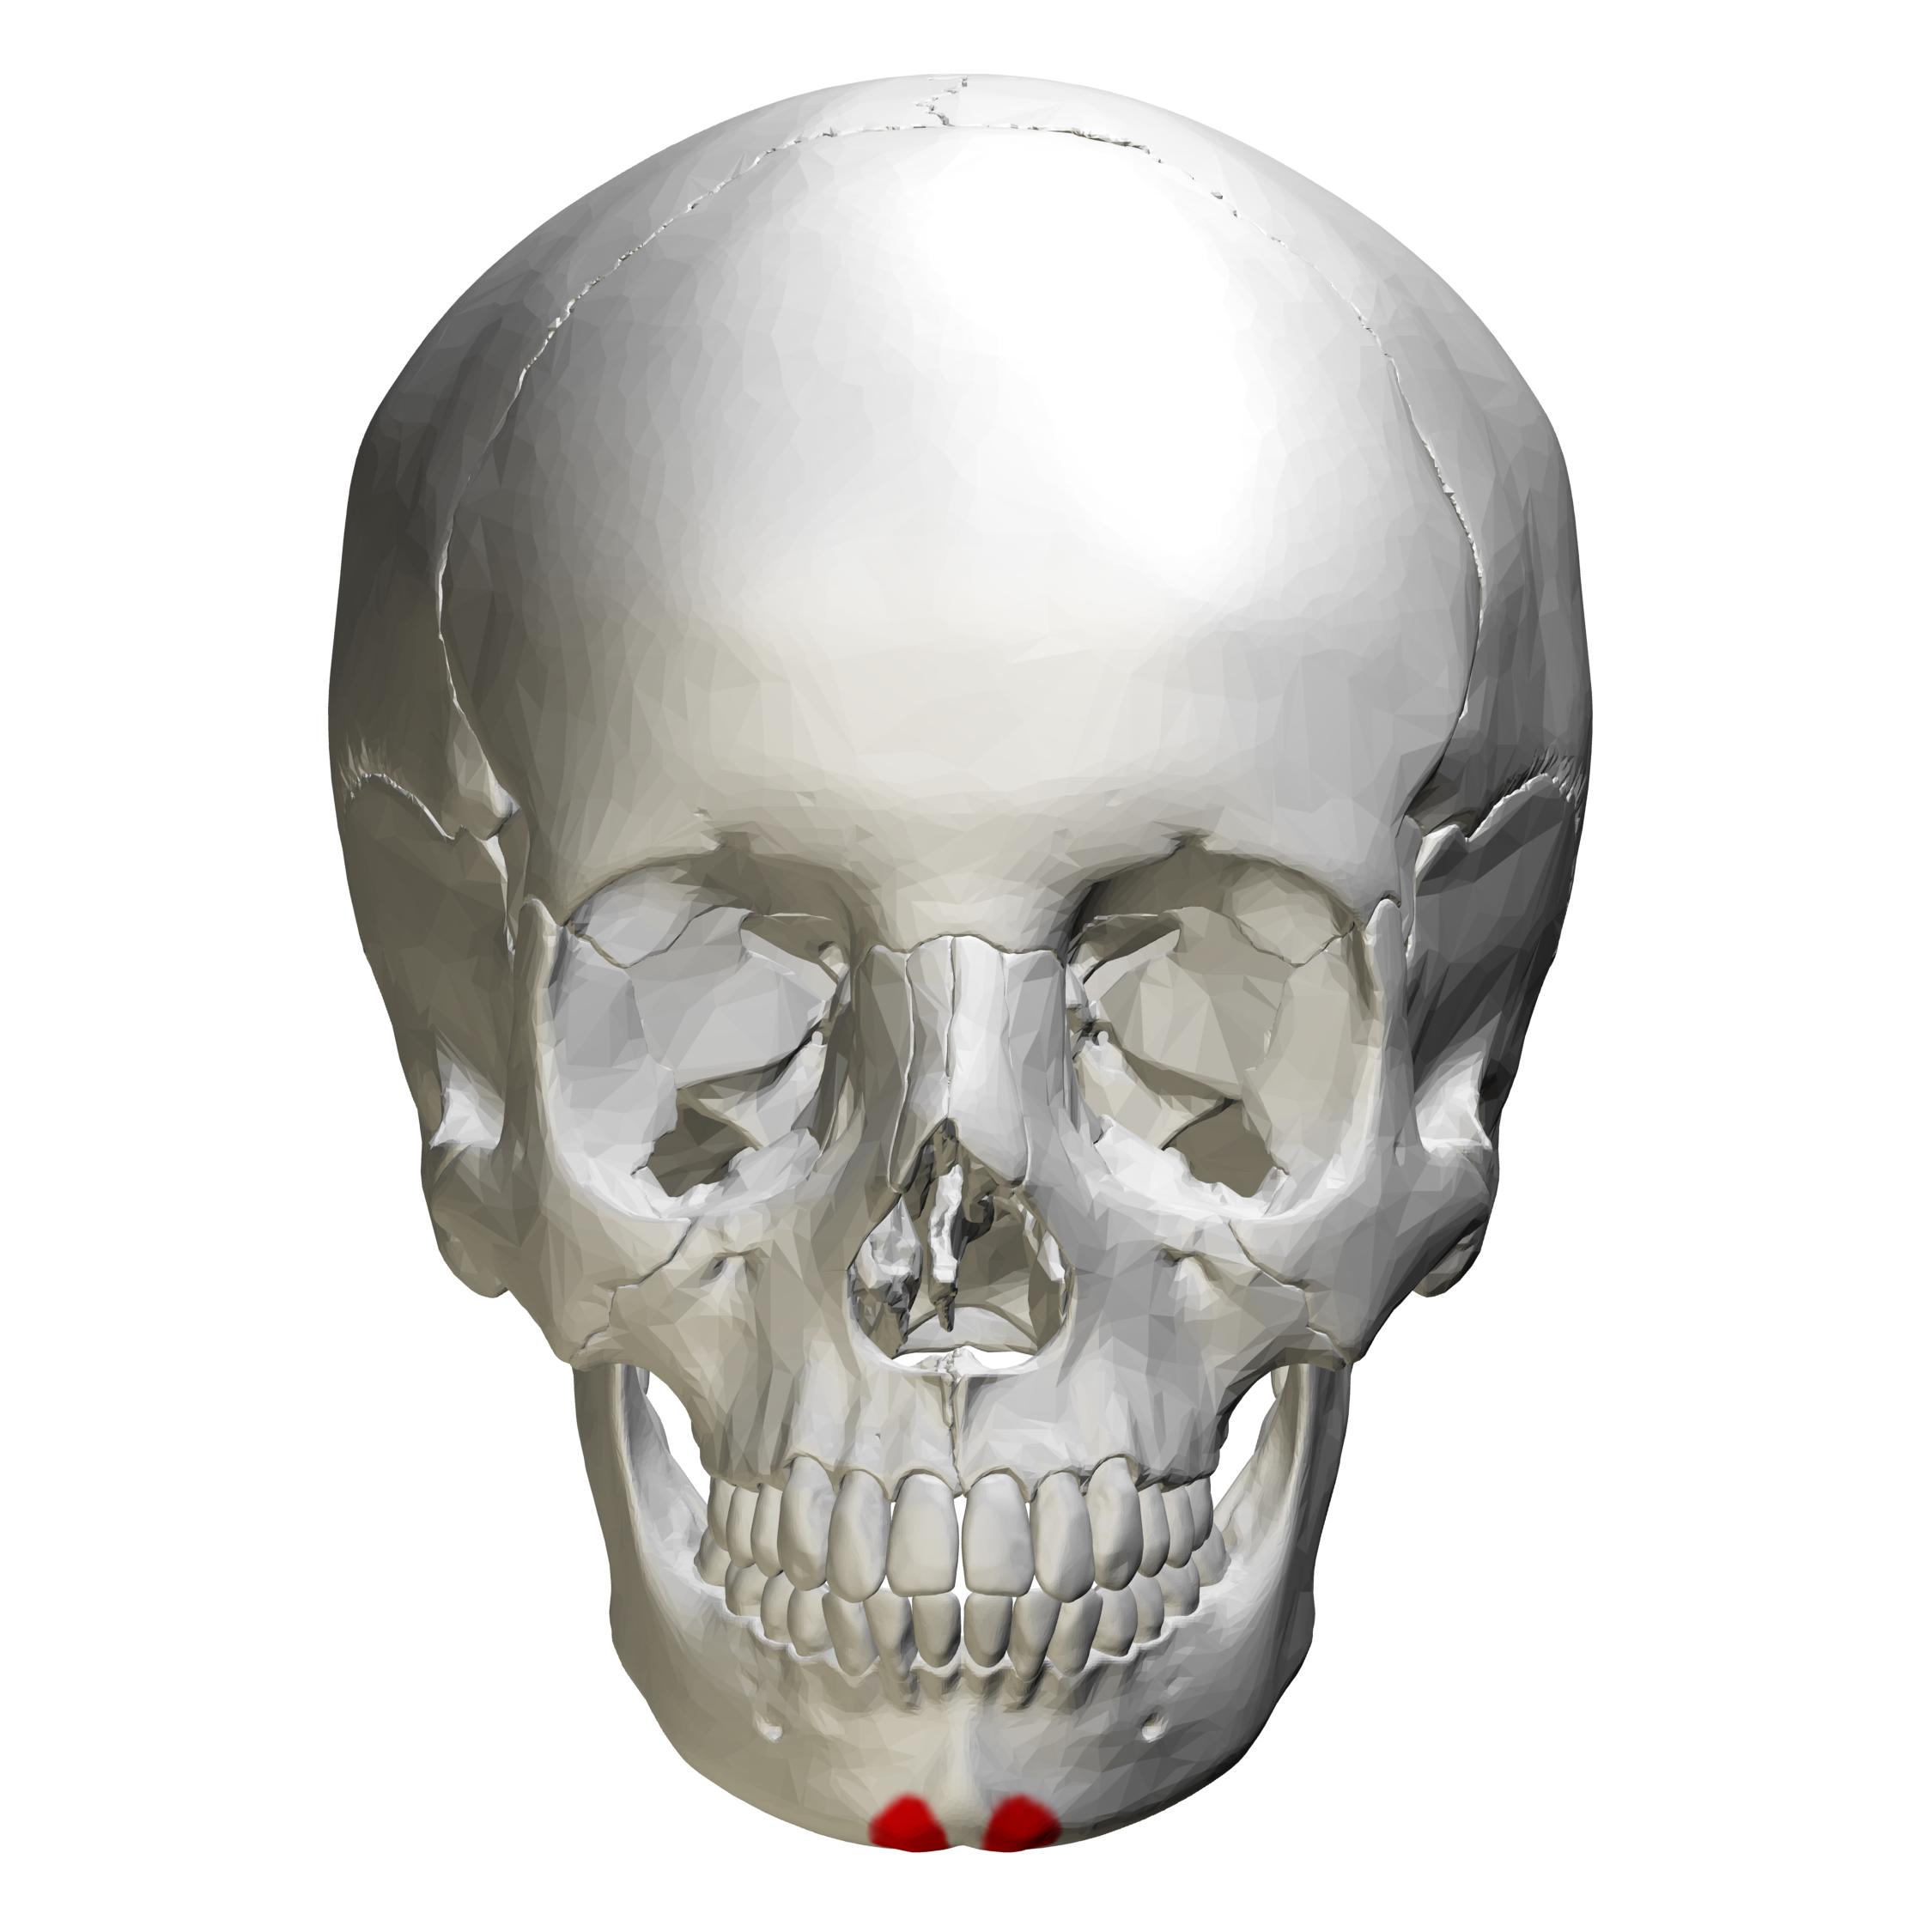 File:Mental tubercle - skull - anterior view01.png ...